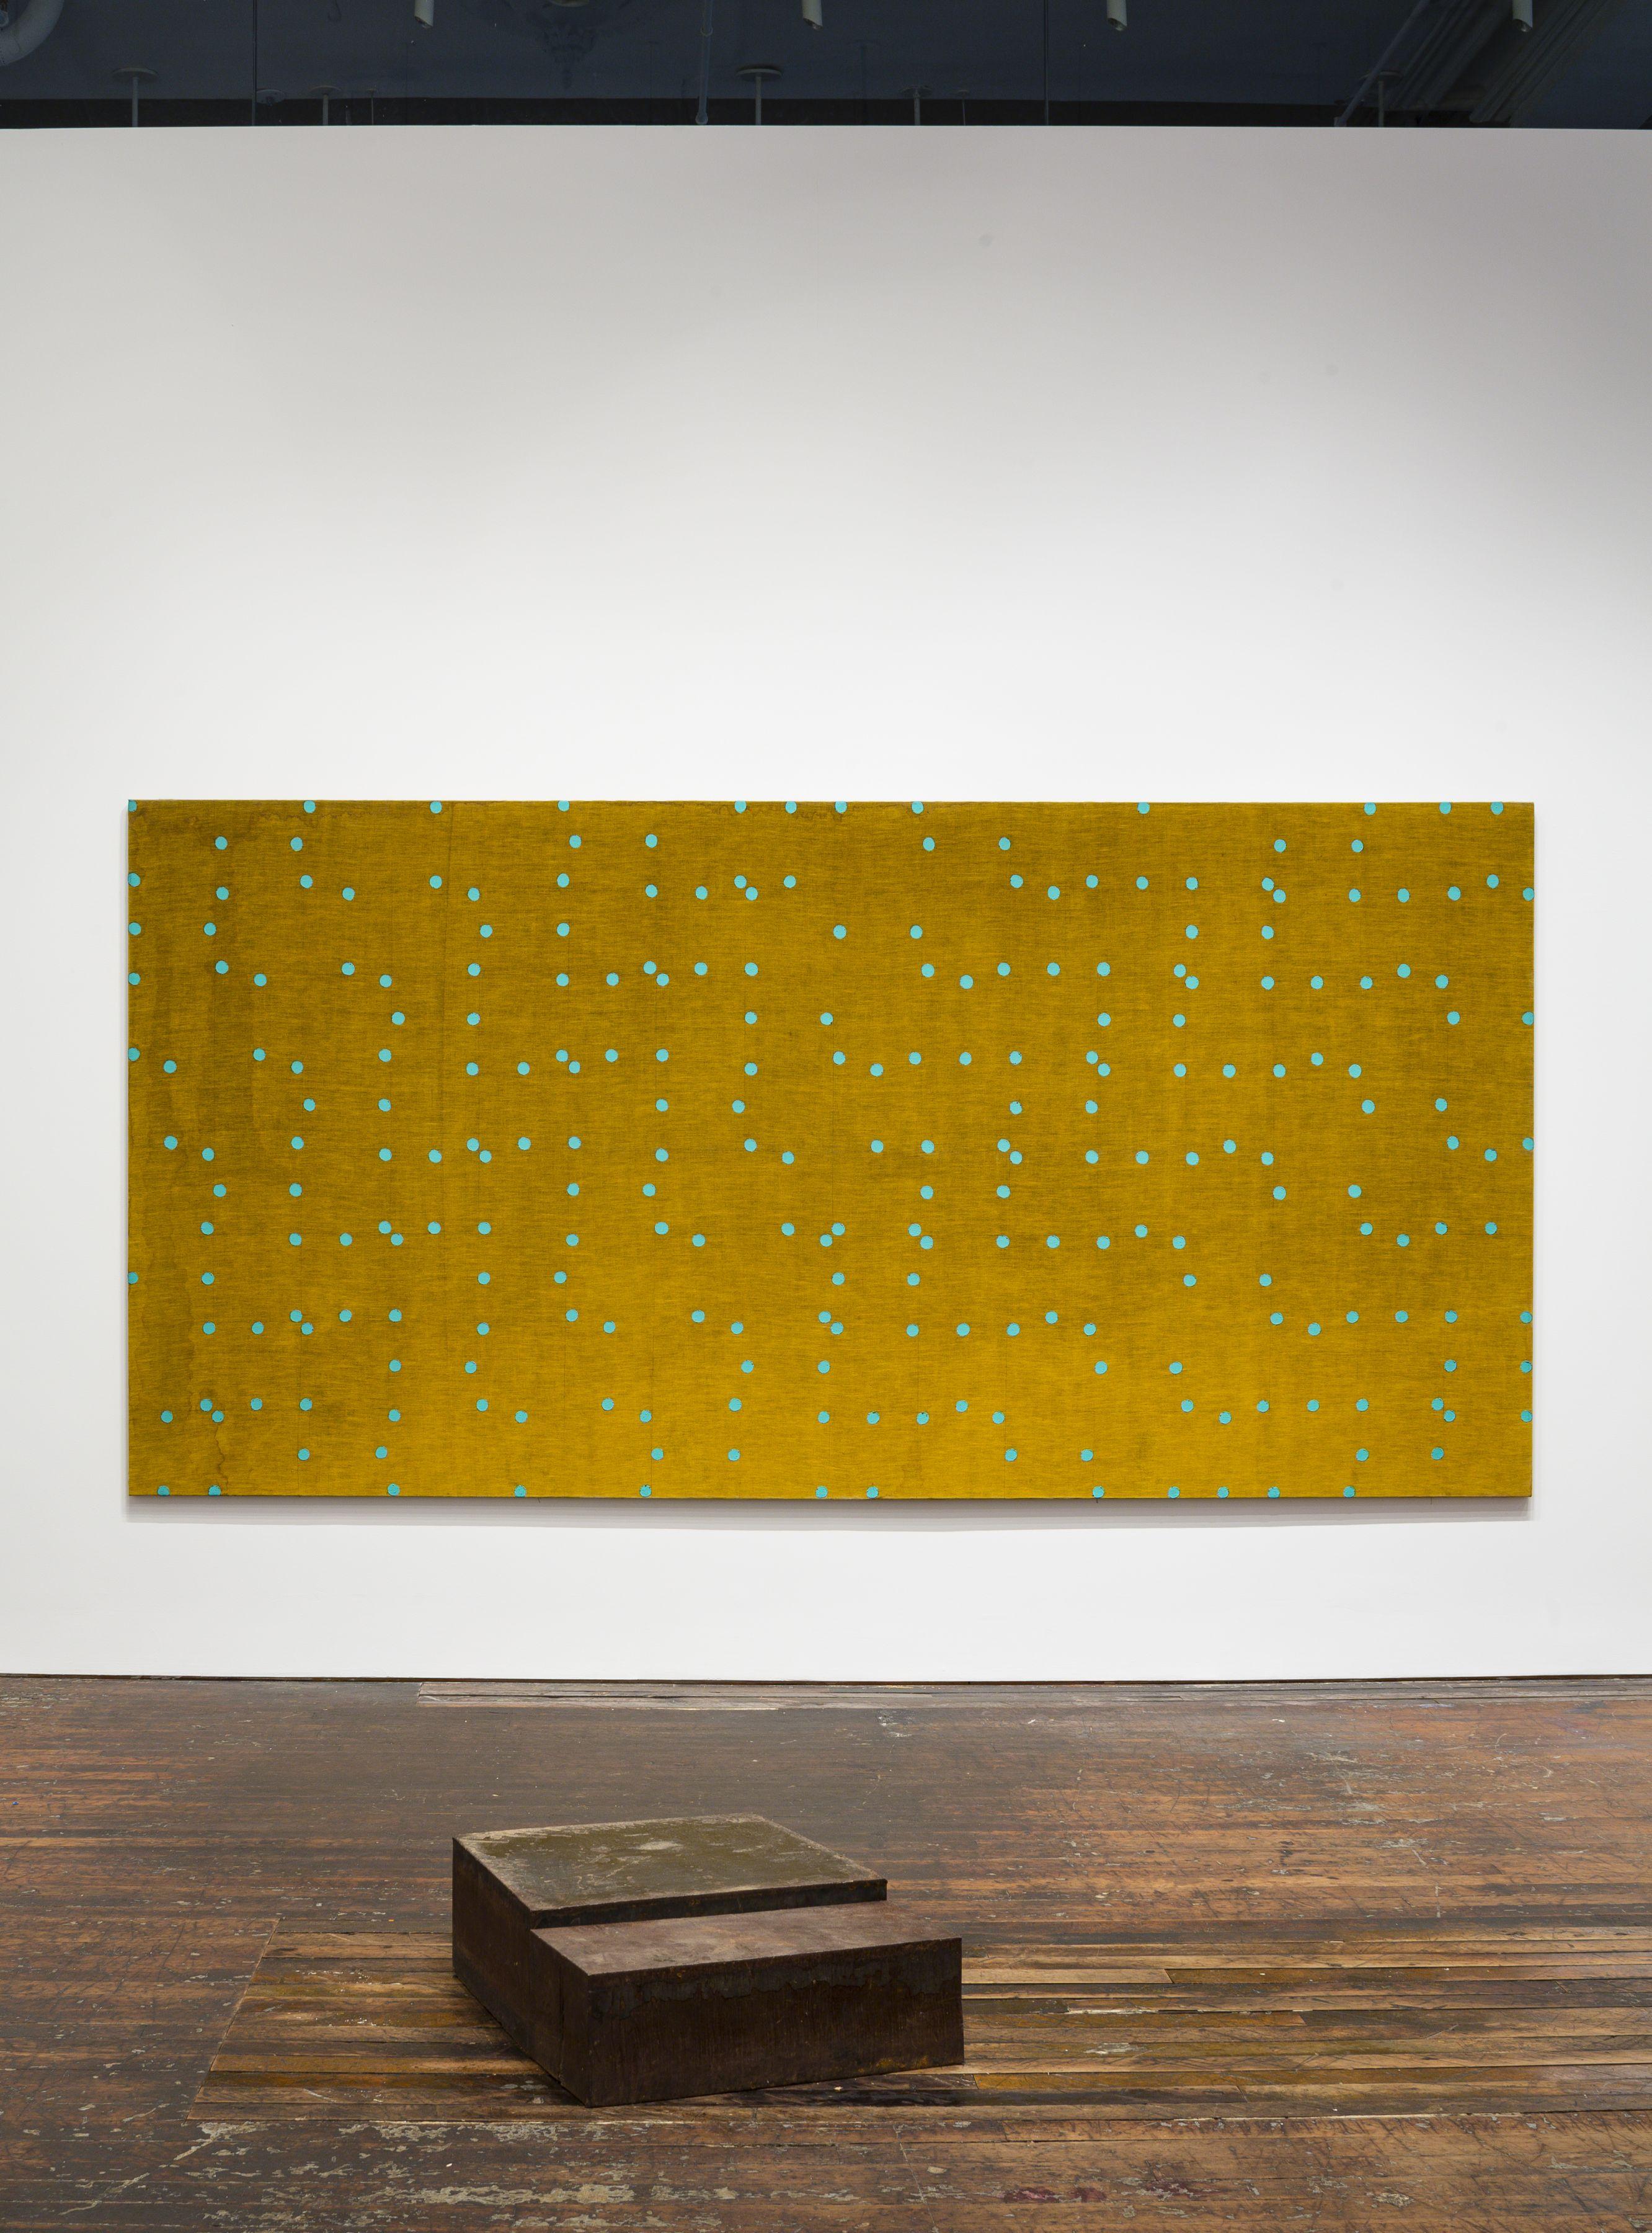 Deadeye Dick: Richard Bellamy and His Circle– installation view 17